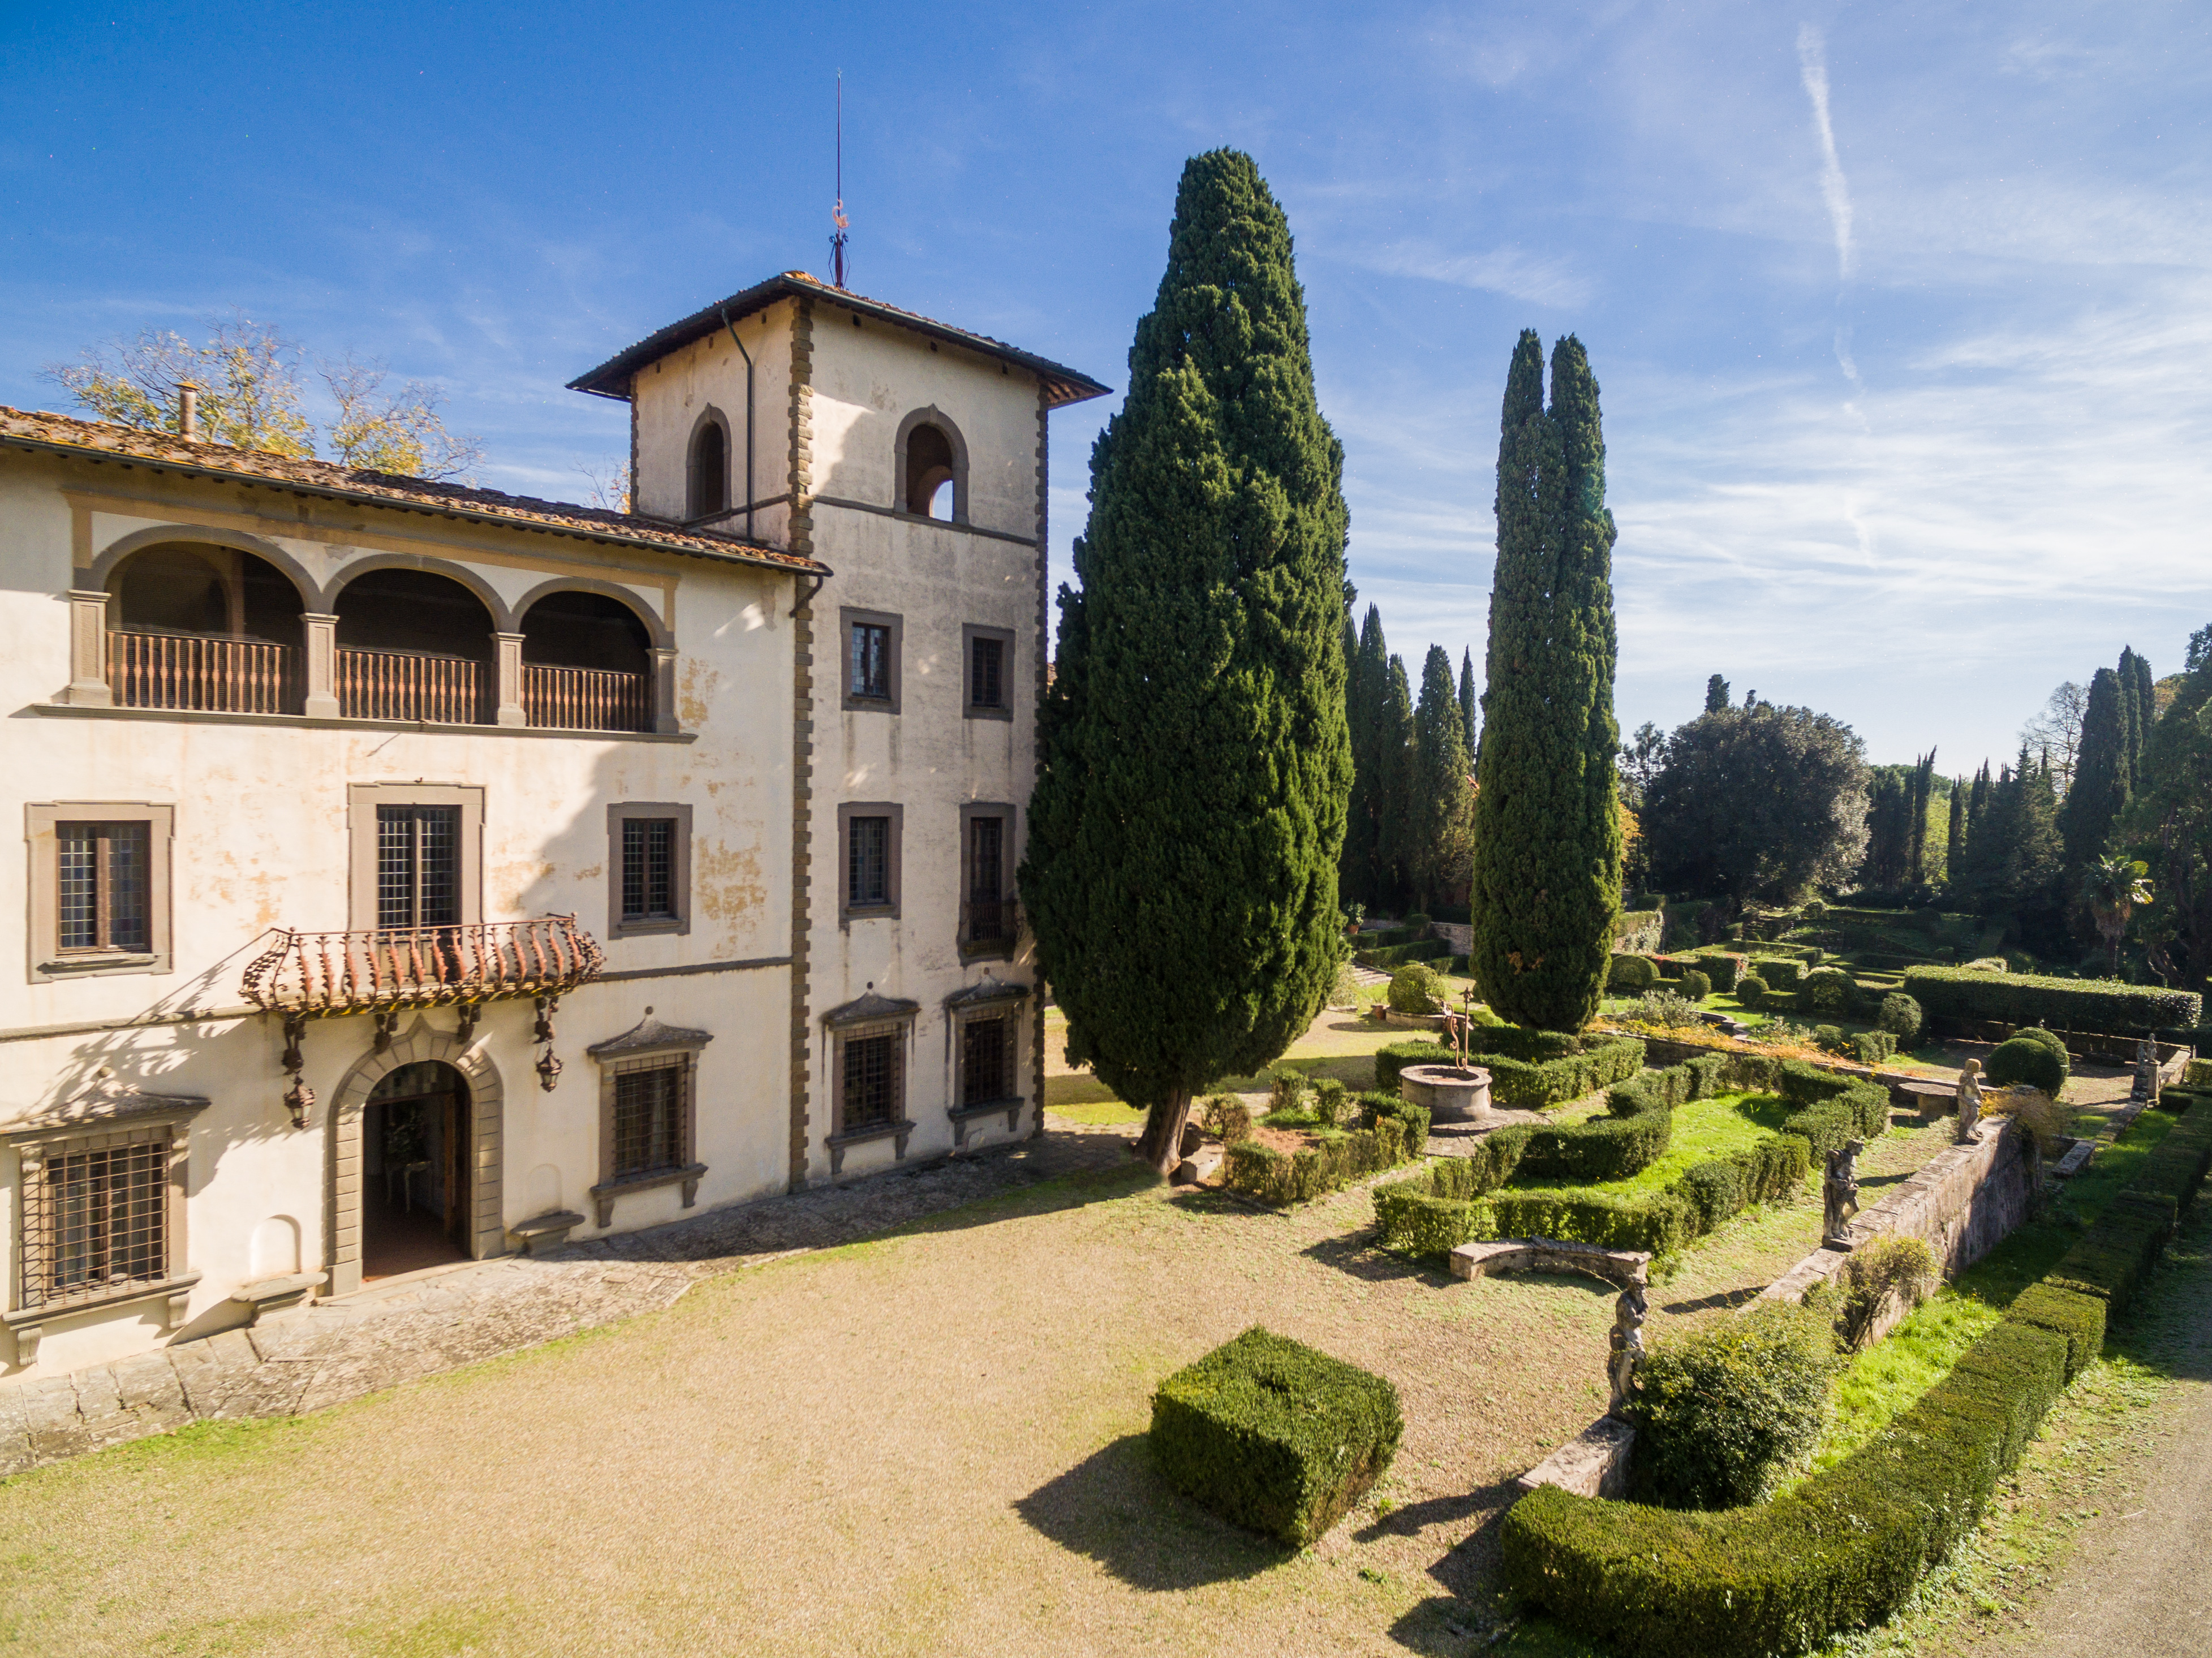 Villa Bibbiani: una cantina fuori dagli standard